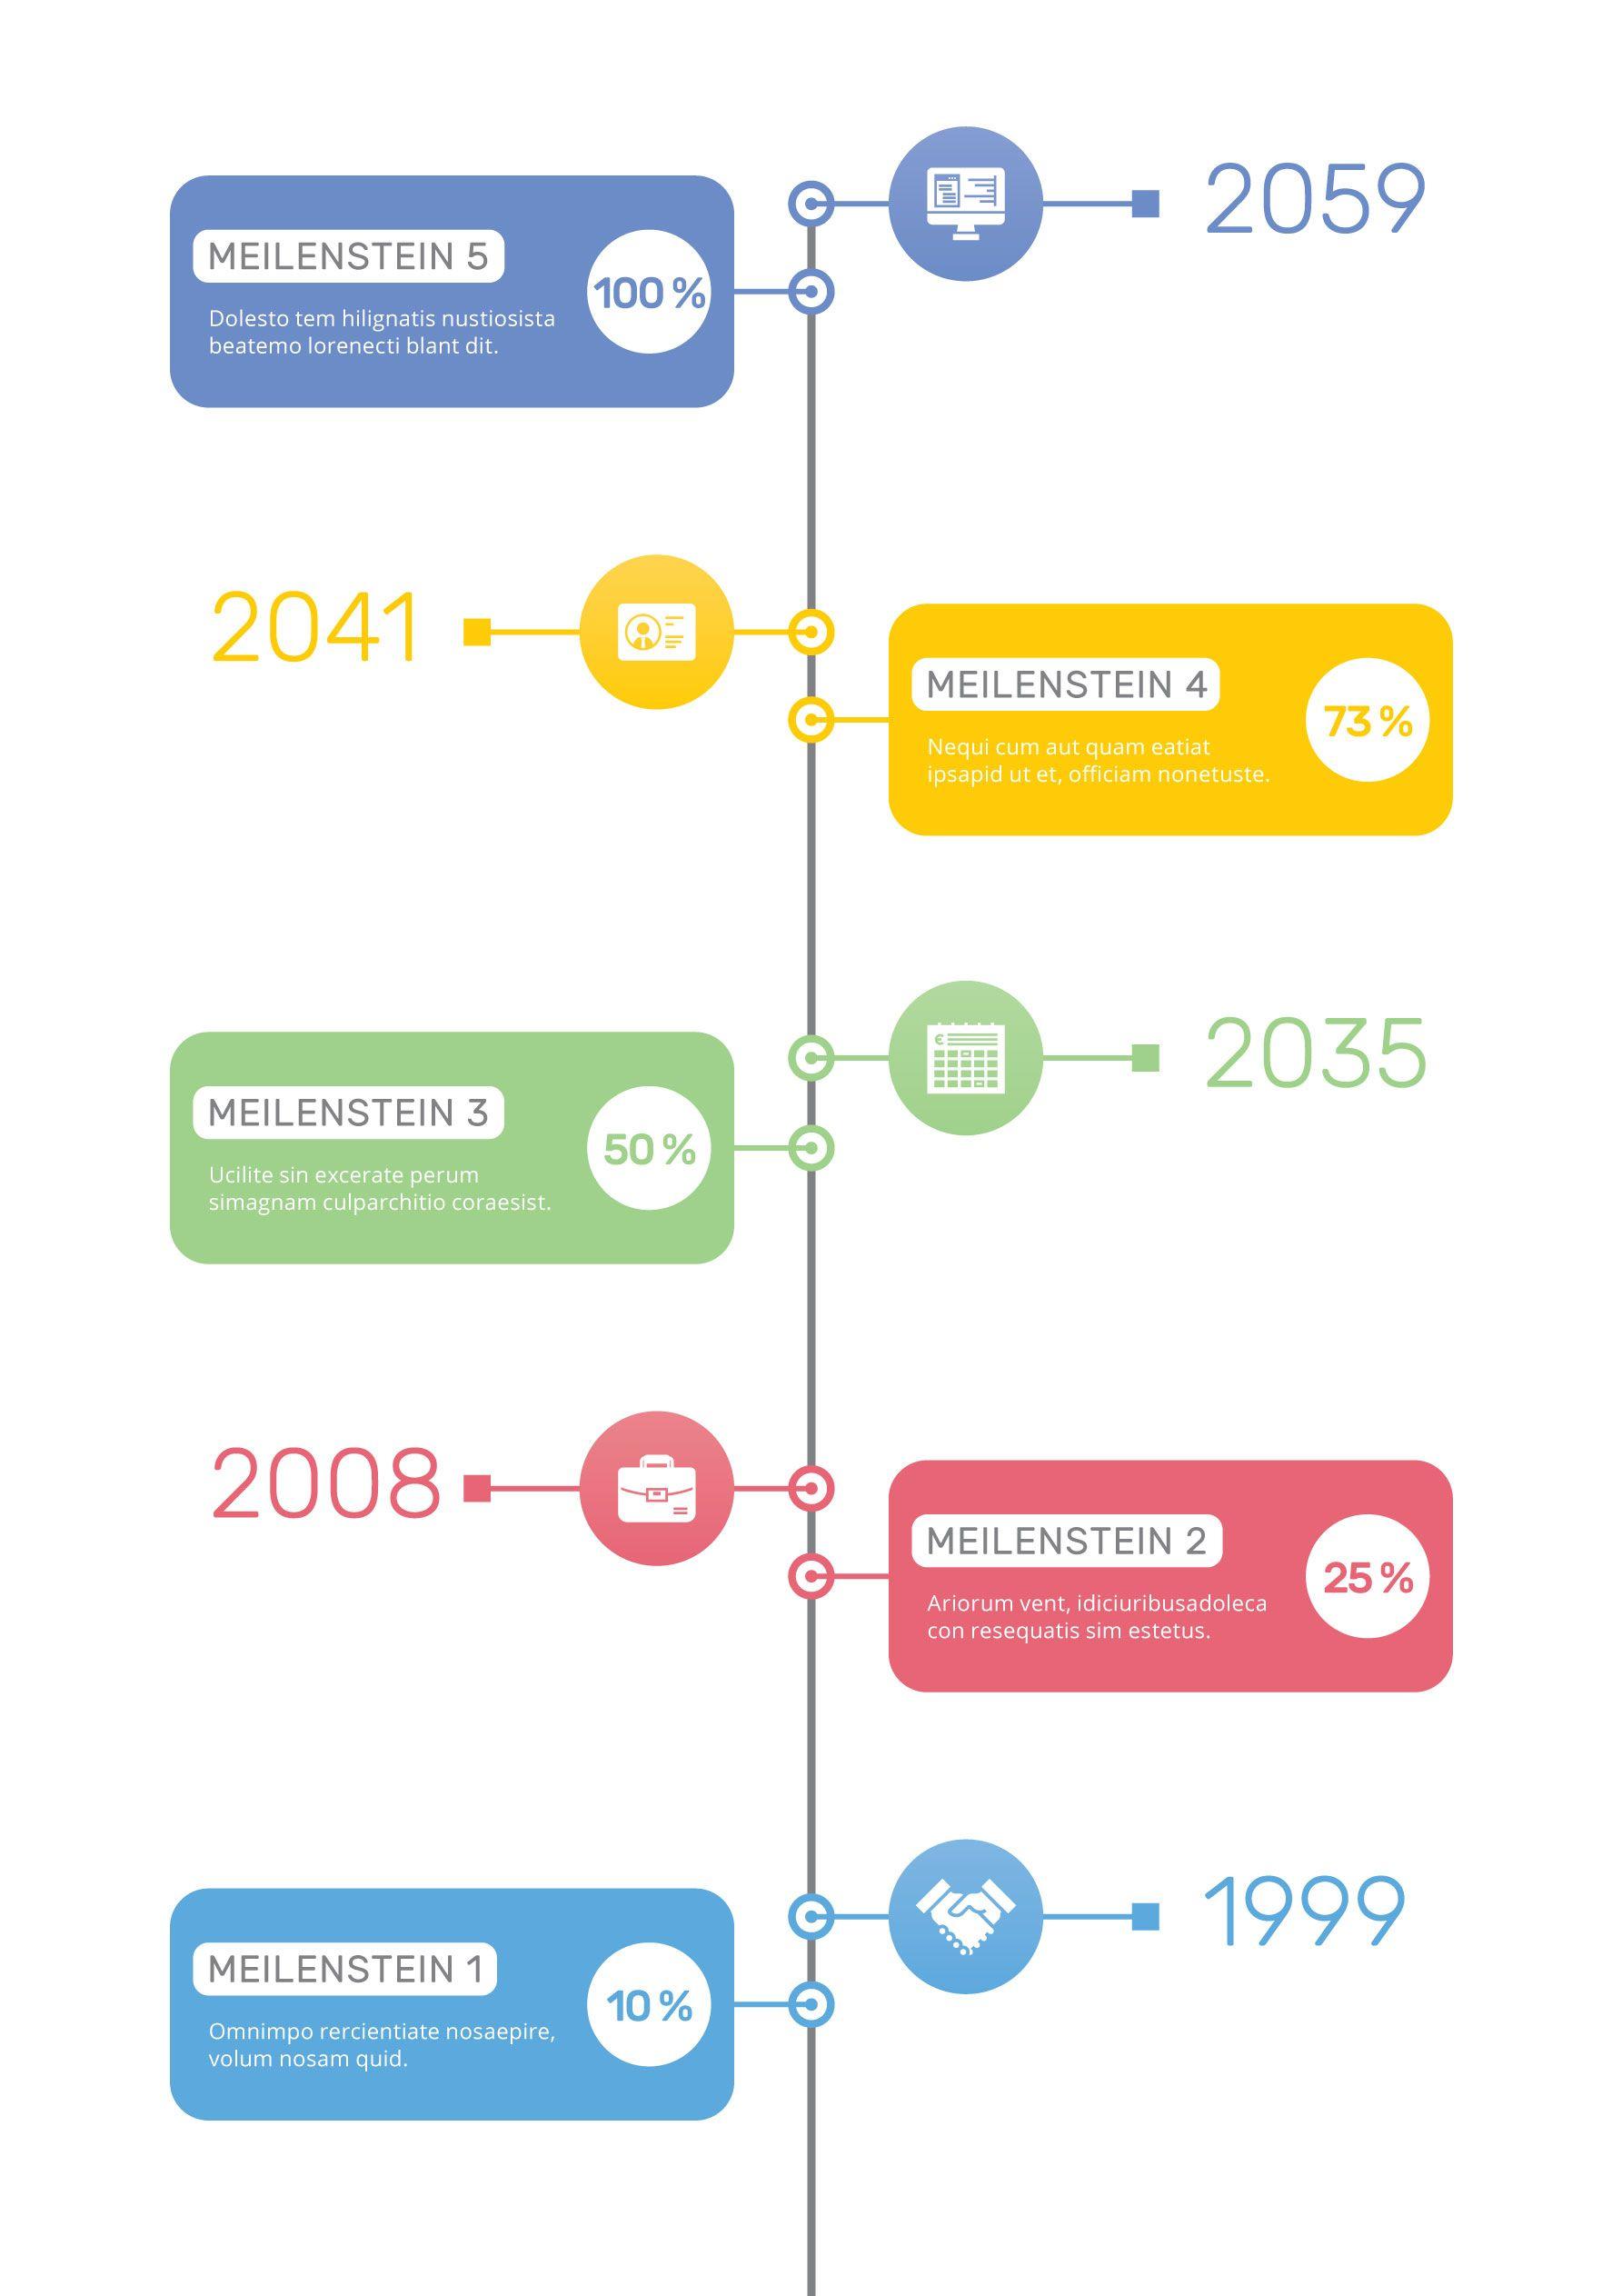 Zeitstrahl Vorlagen Moderne Timelines Erstellen Zeitstrahl Vorlagen Vektorgrafik Erstellen